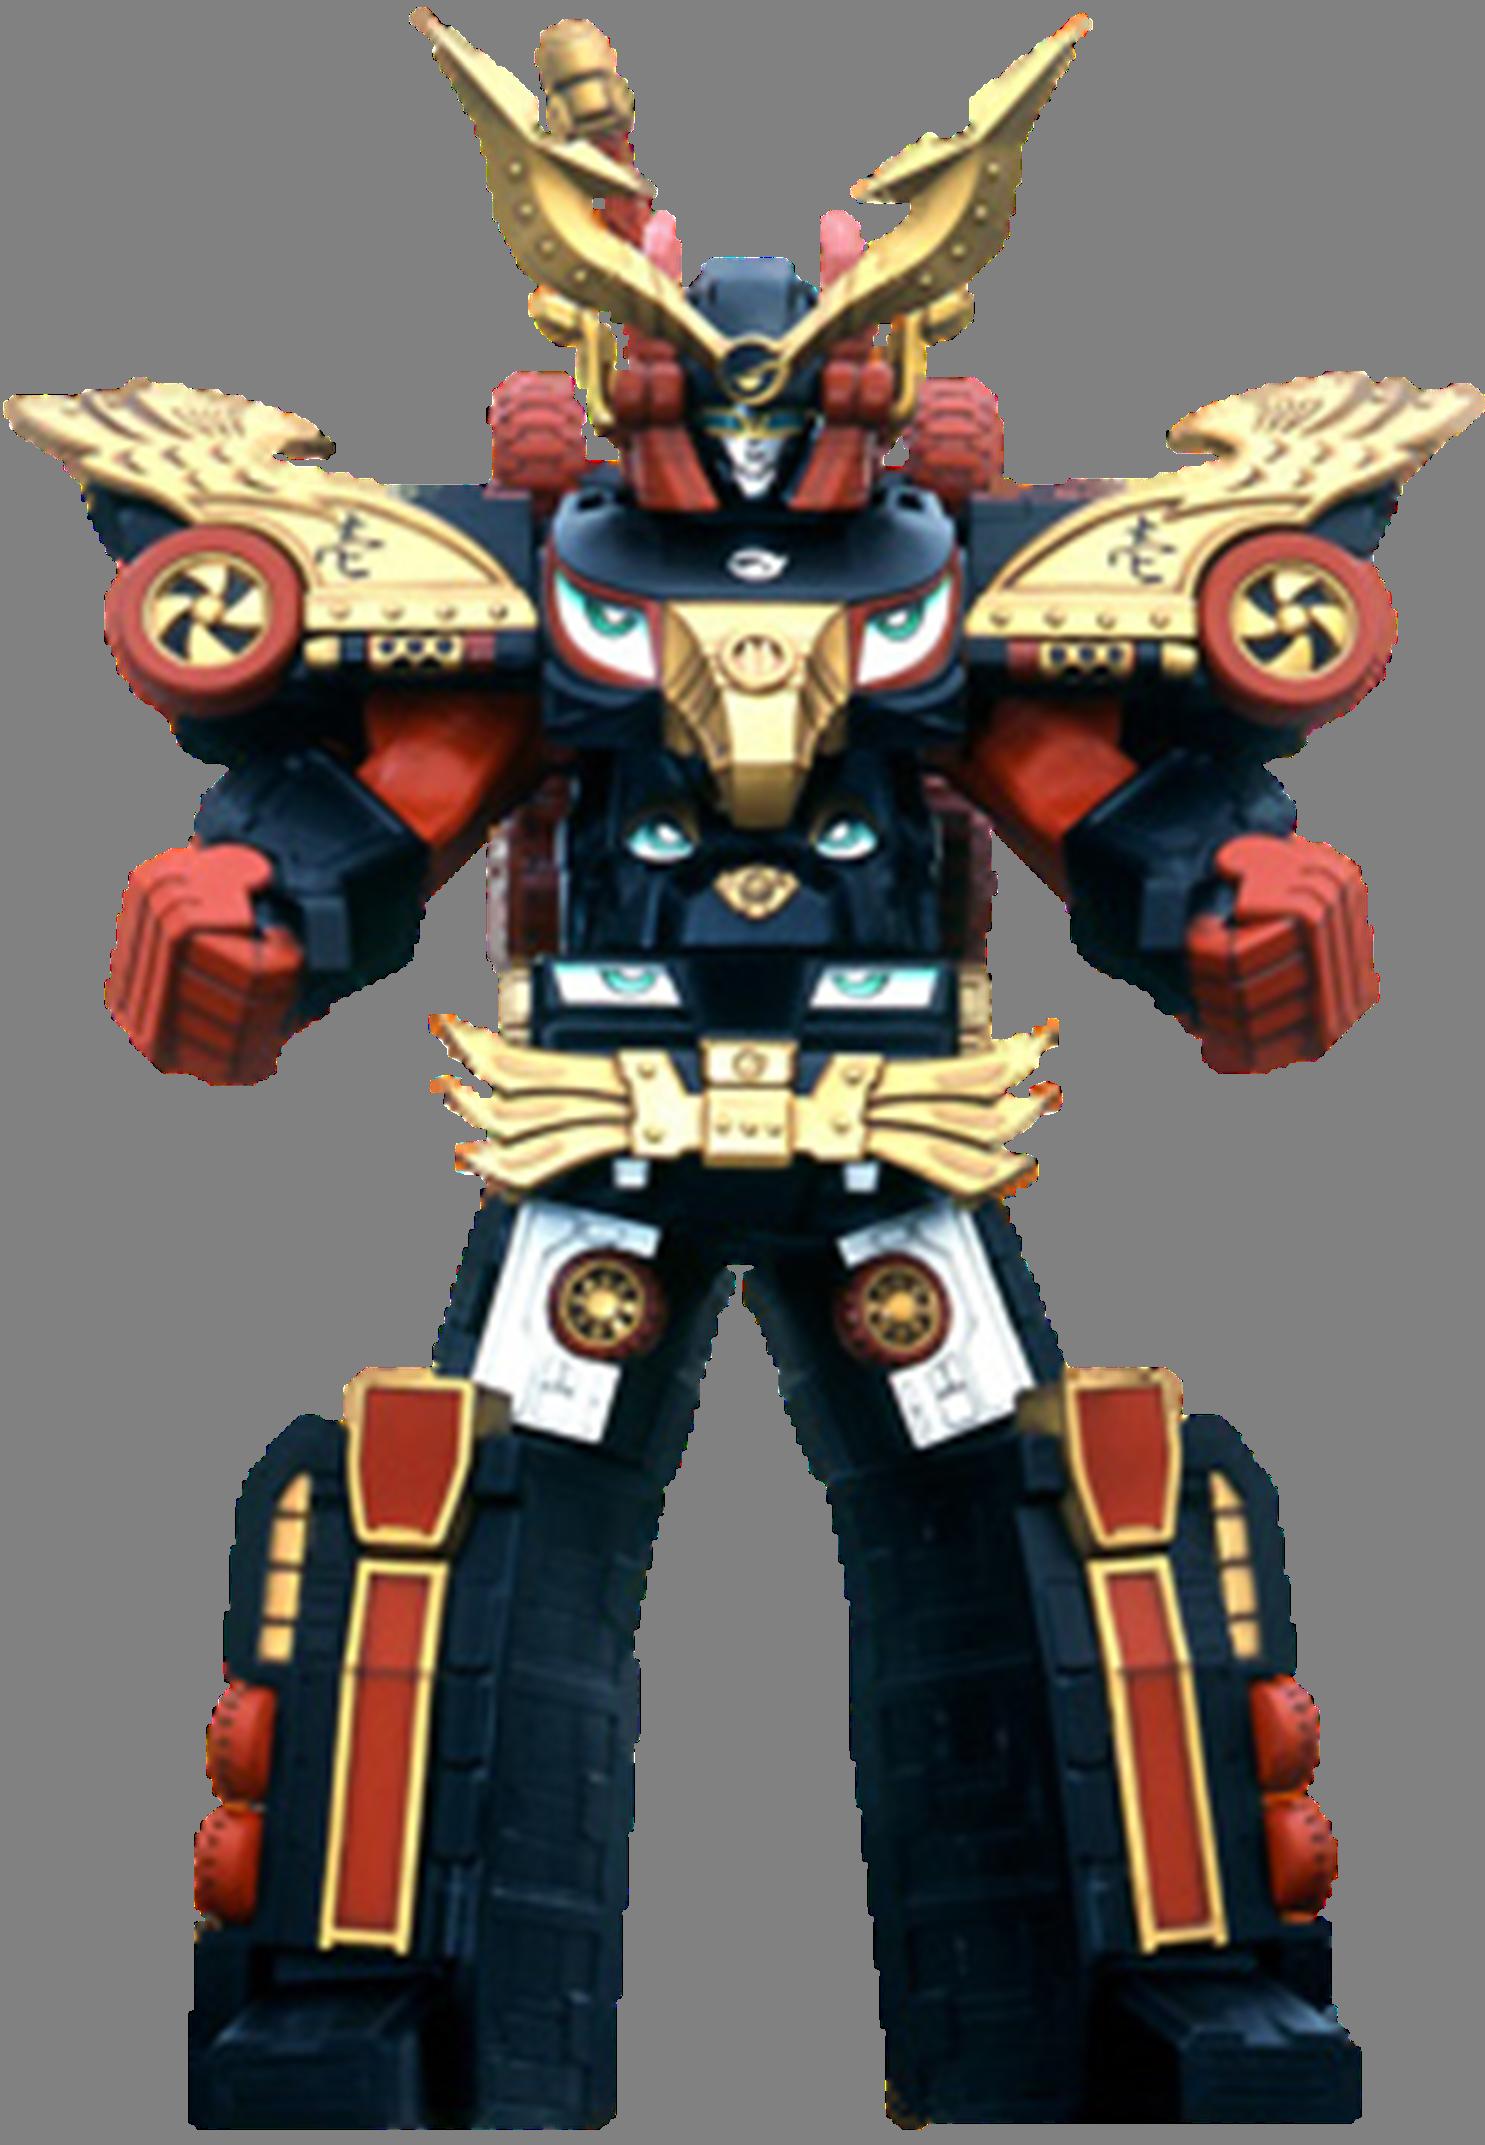 Comparison:Engine Dai-Shogun vs. Engine Shogun Megazord